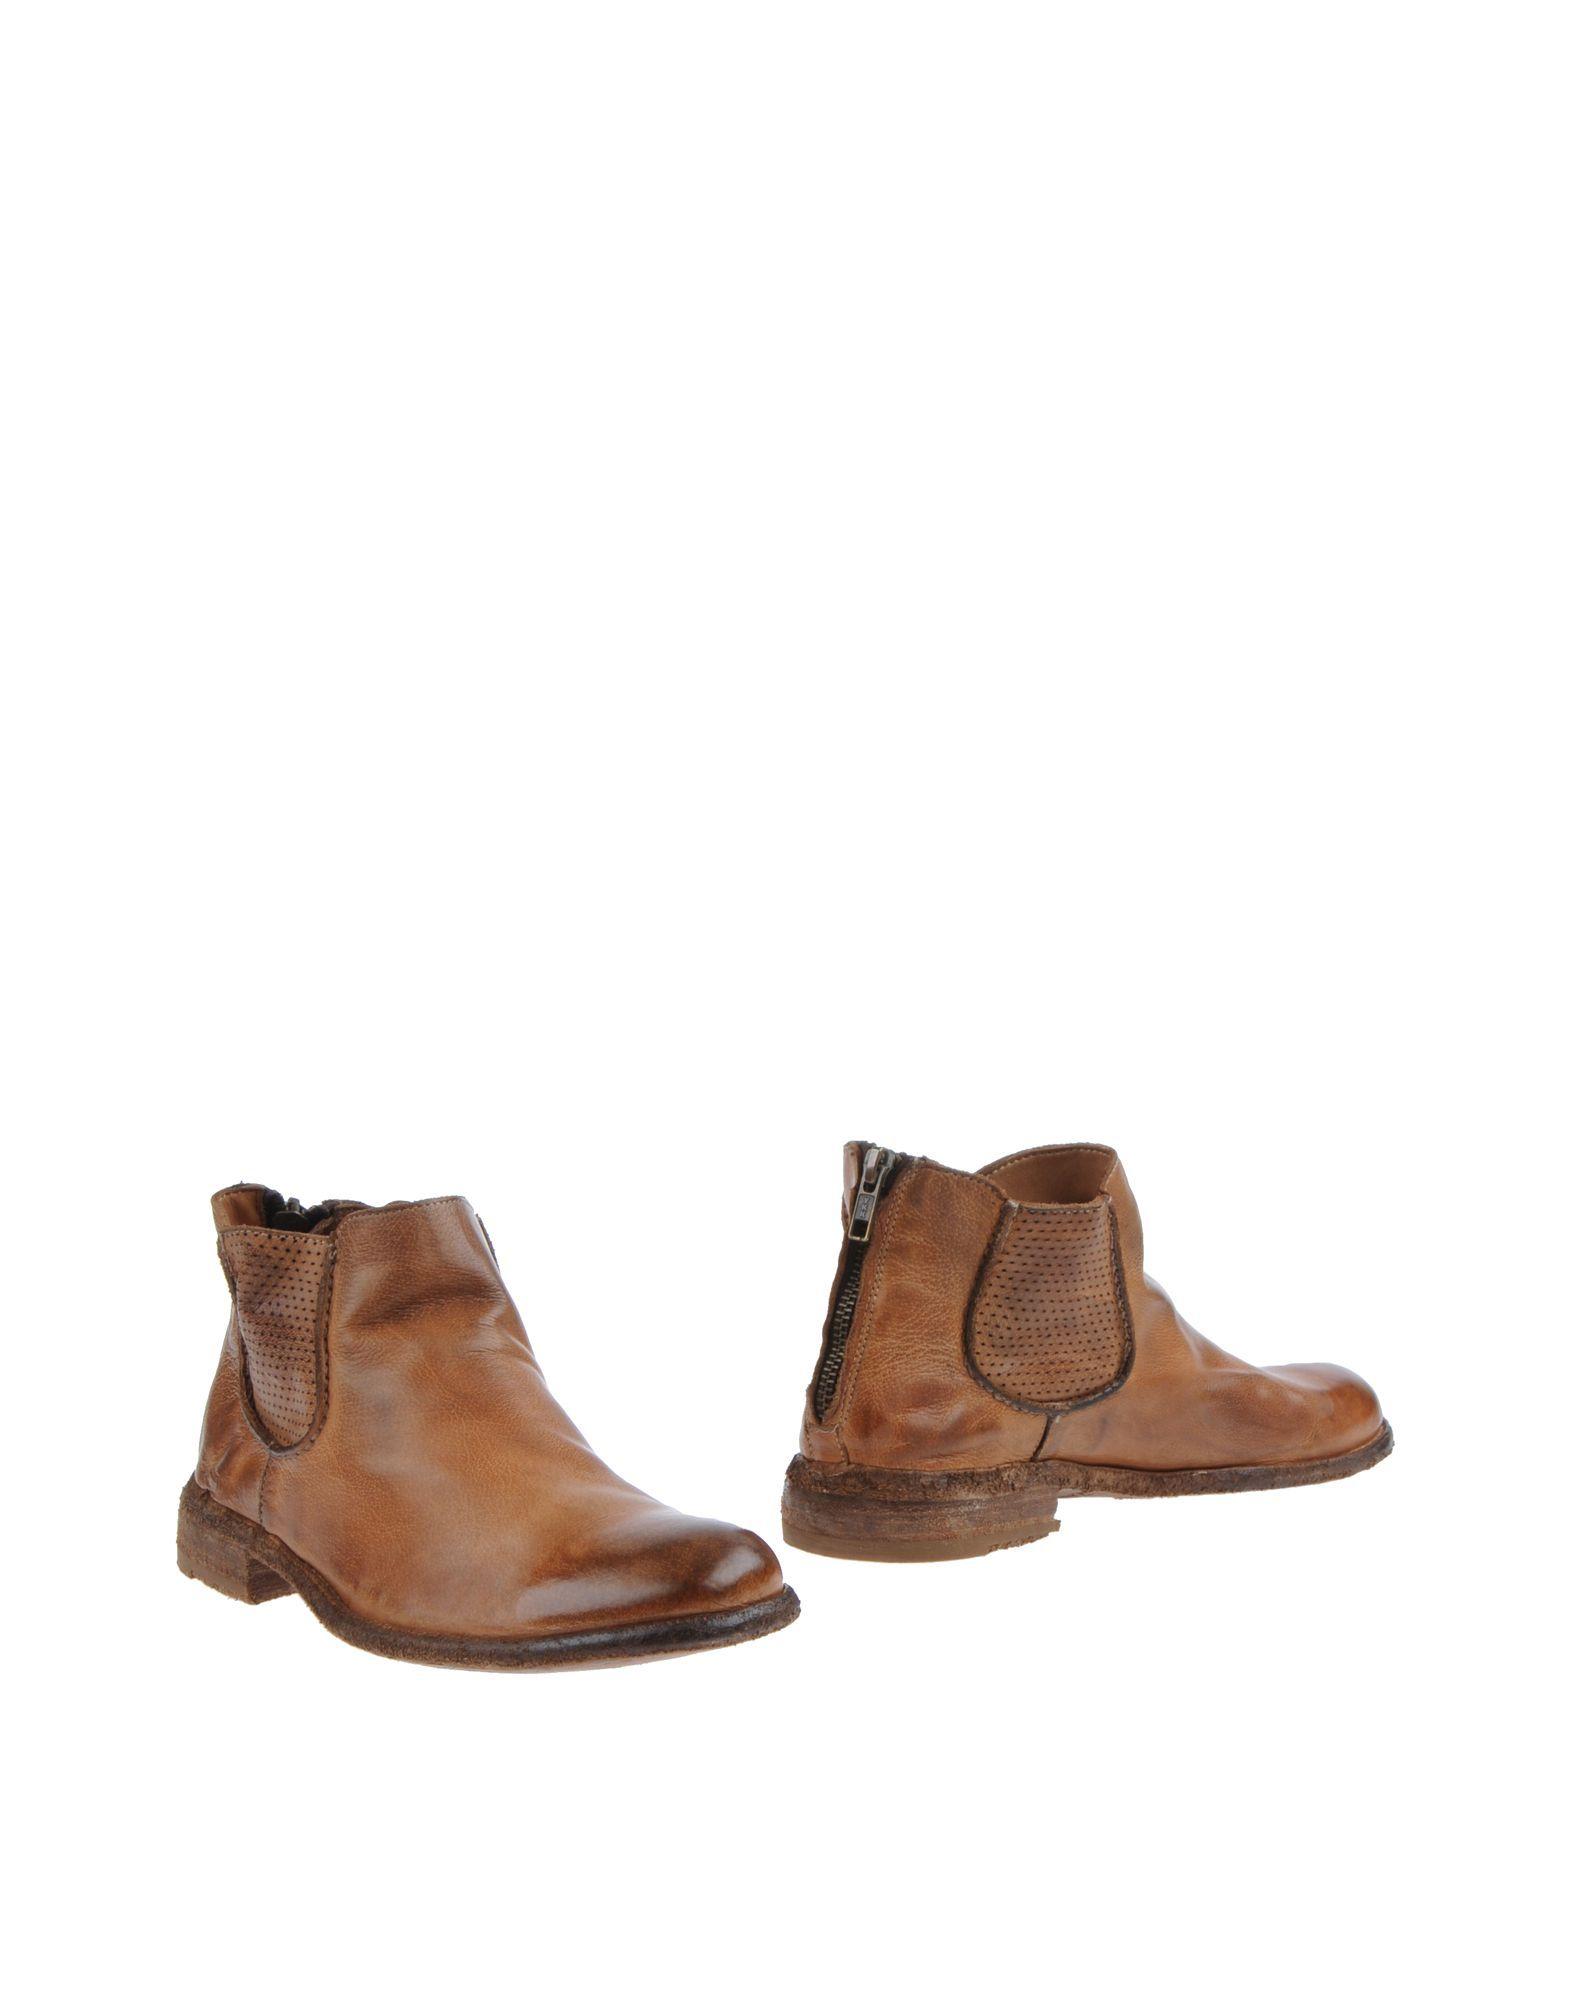 Chaussures - Bottes De Chaussures Officine Italia Créatives 3bCrNv